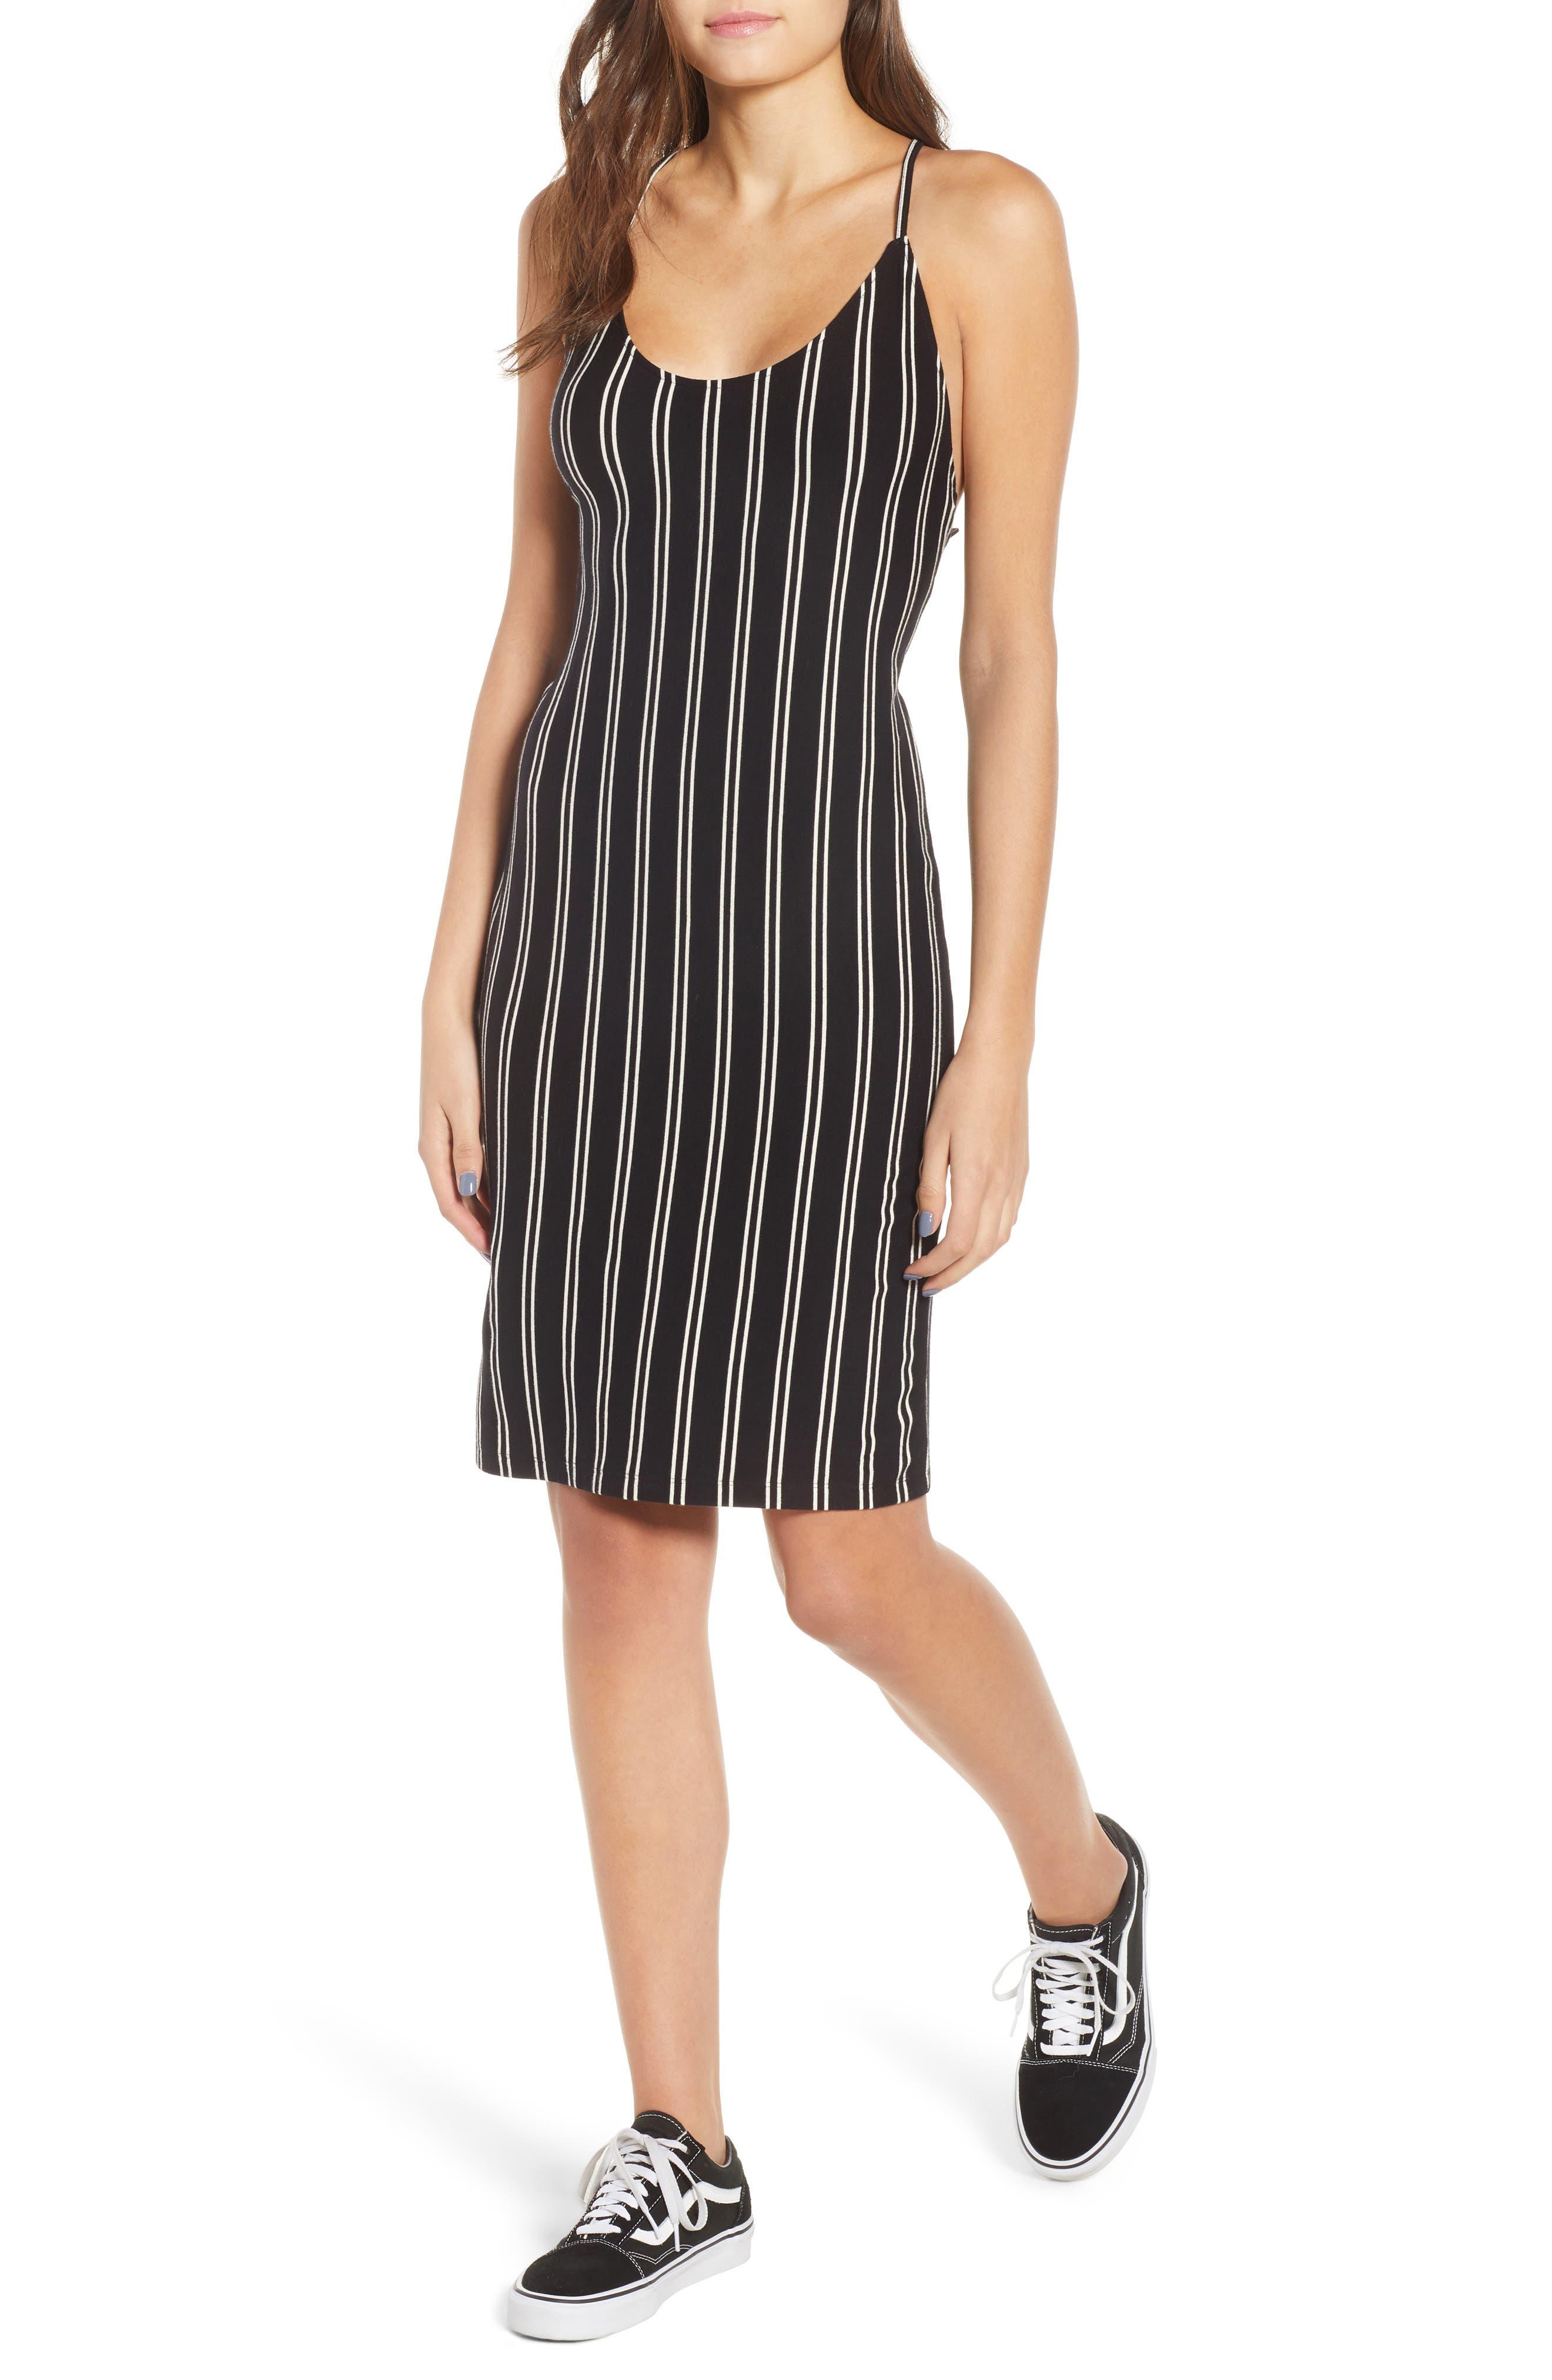 Lockette Strappy Striped Dress,                             Main thumbnail 1, color,                             Jet Black Multi